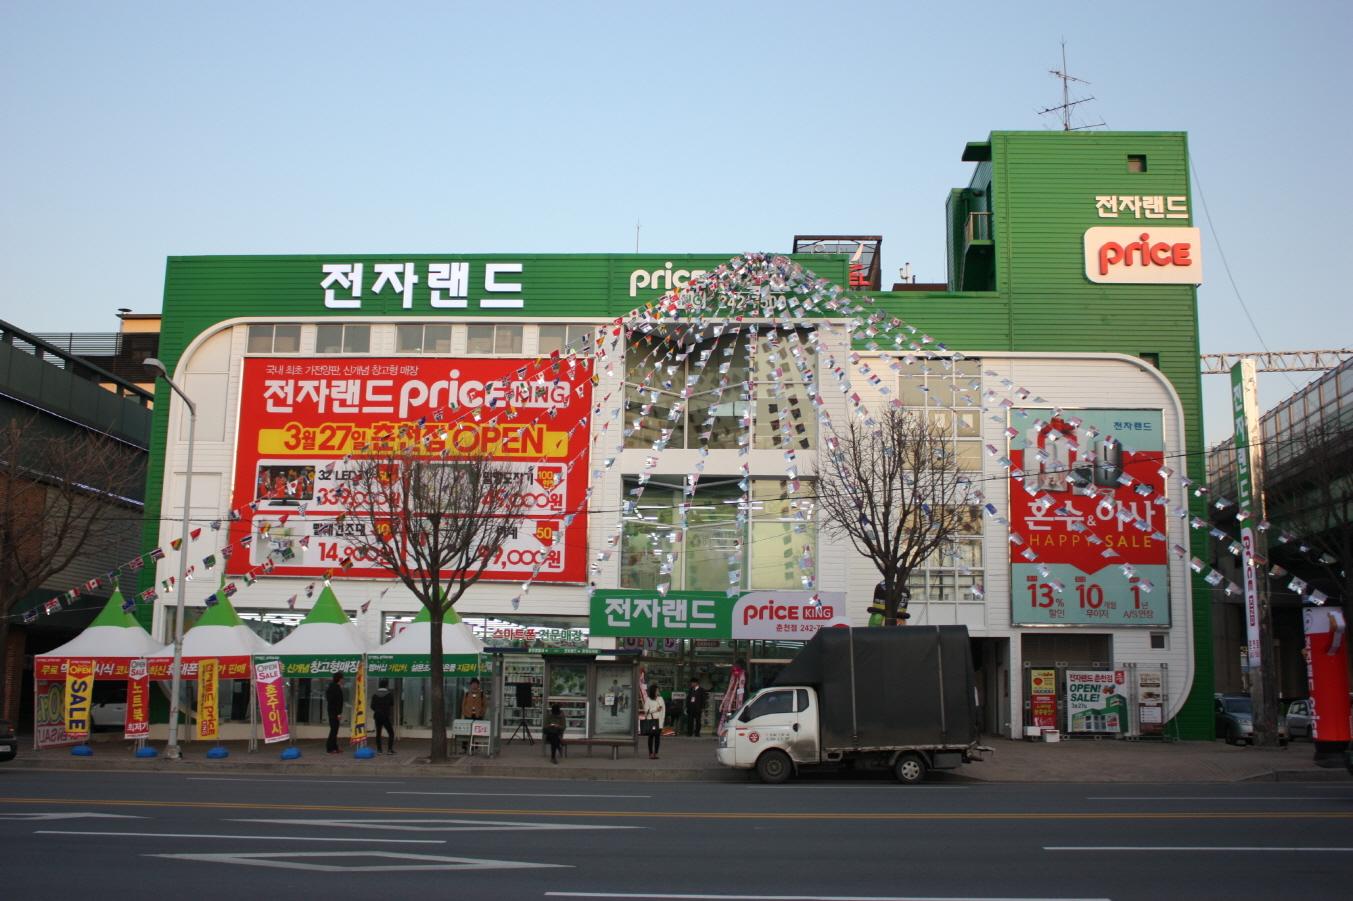 ET Land Price King – Chuncheon Branch (전자랜드 프라이스킹 (춘천점))